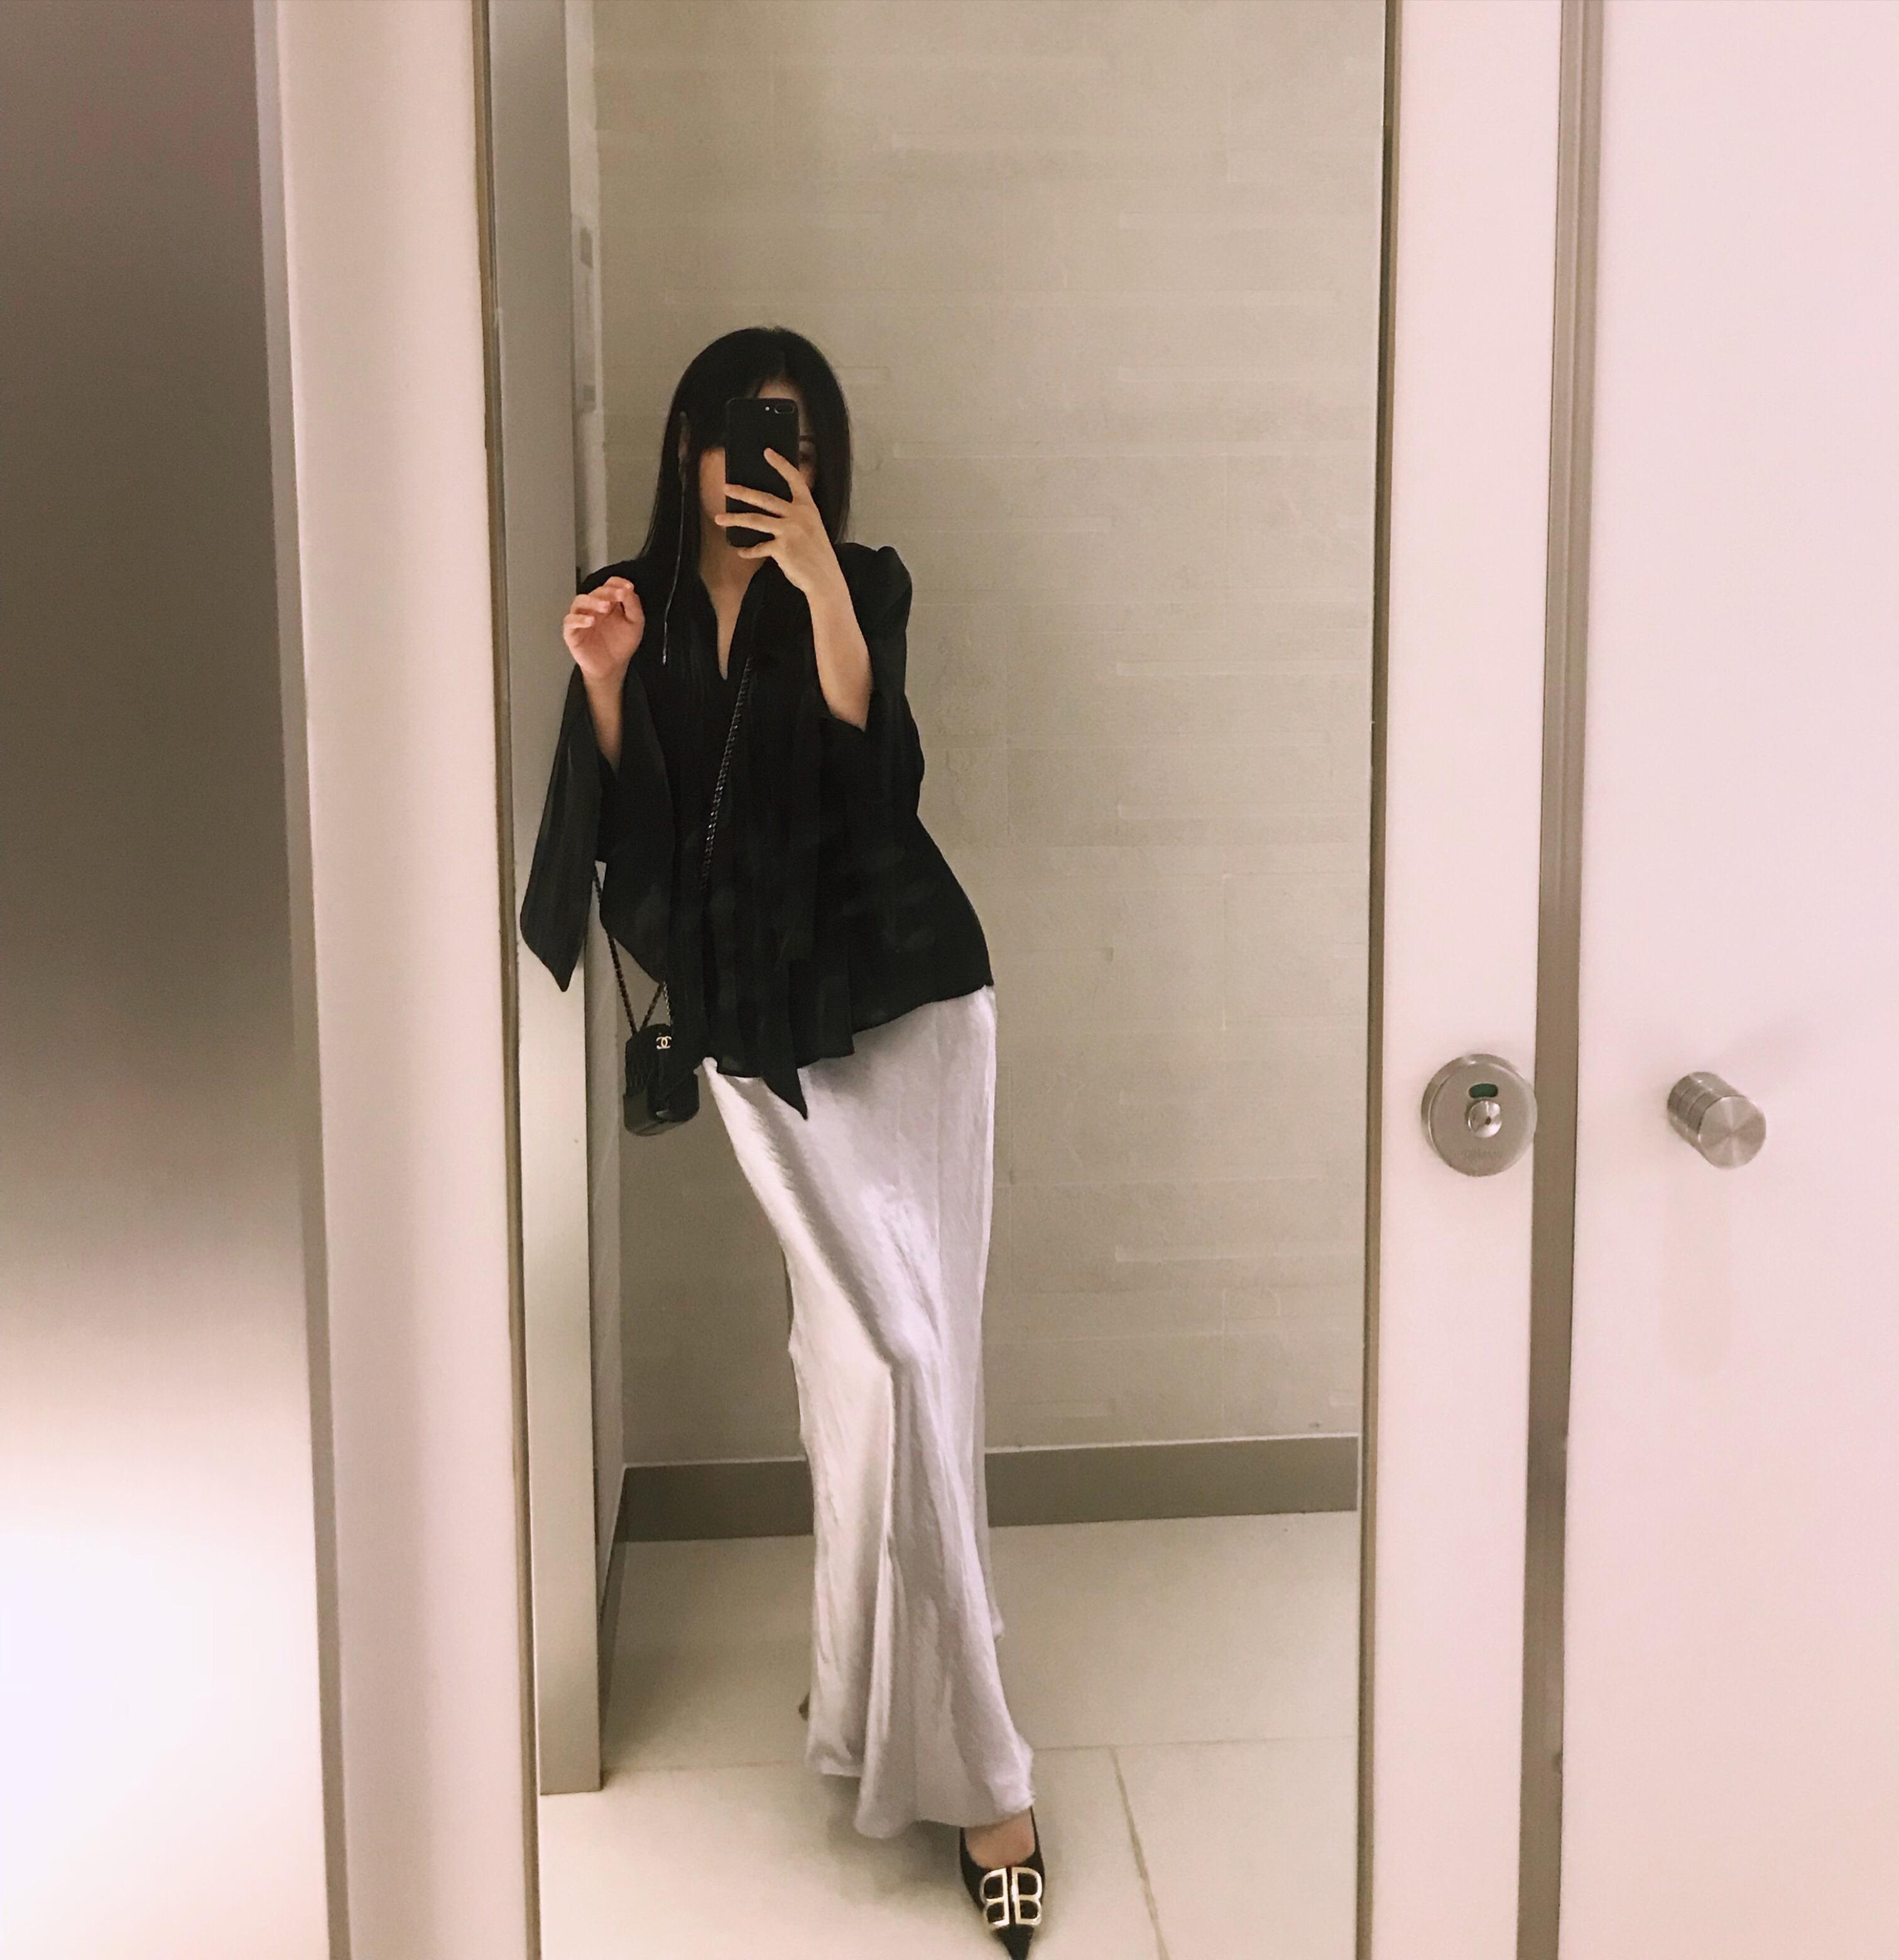 WM妙匠 chic鱼尾裙光泽感大摆修身包臀不规则半身长裙高腰显瘦女